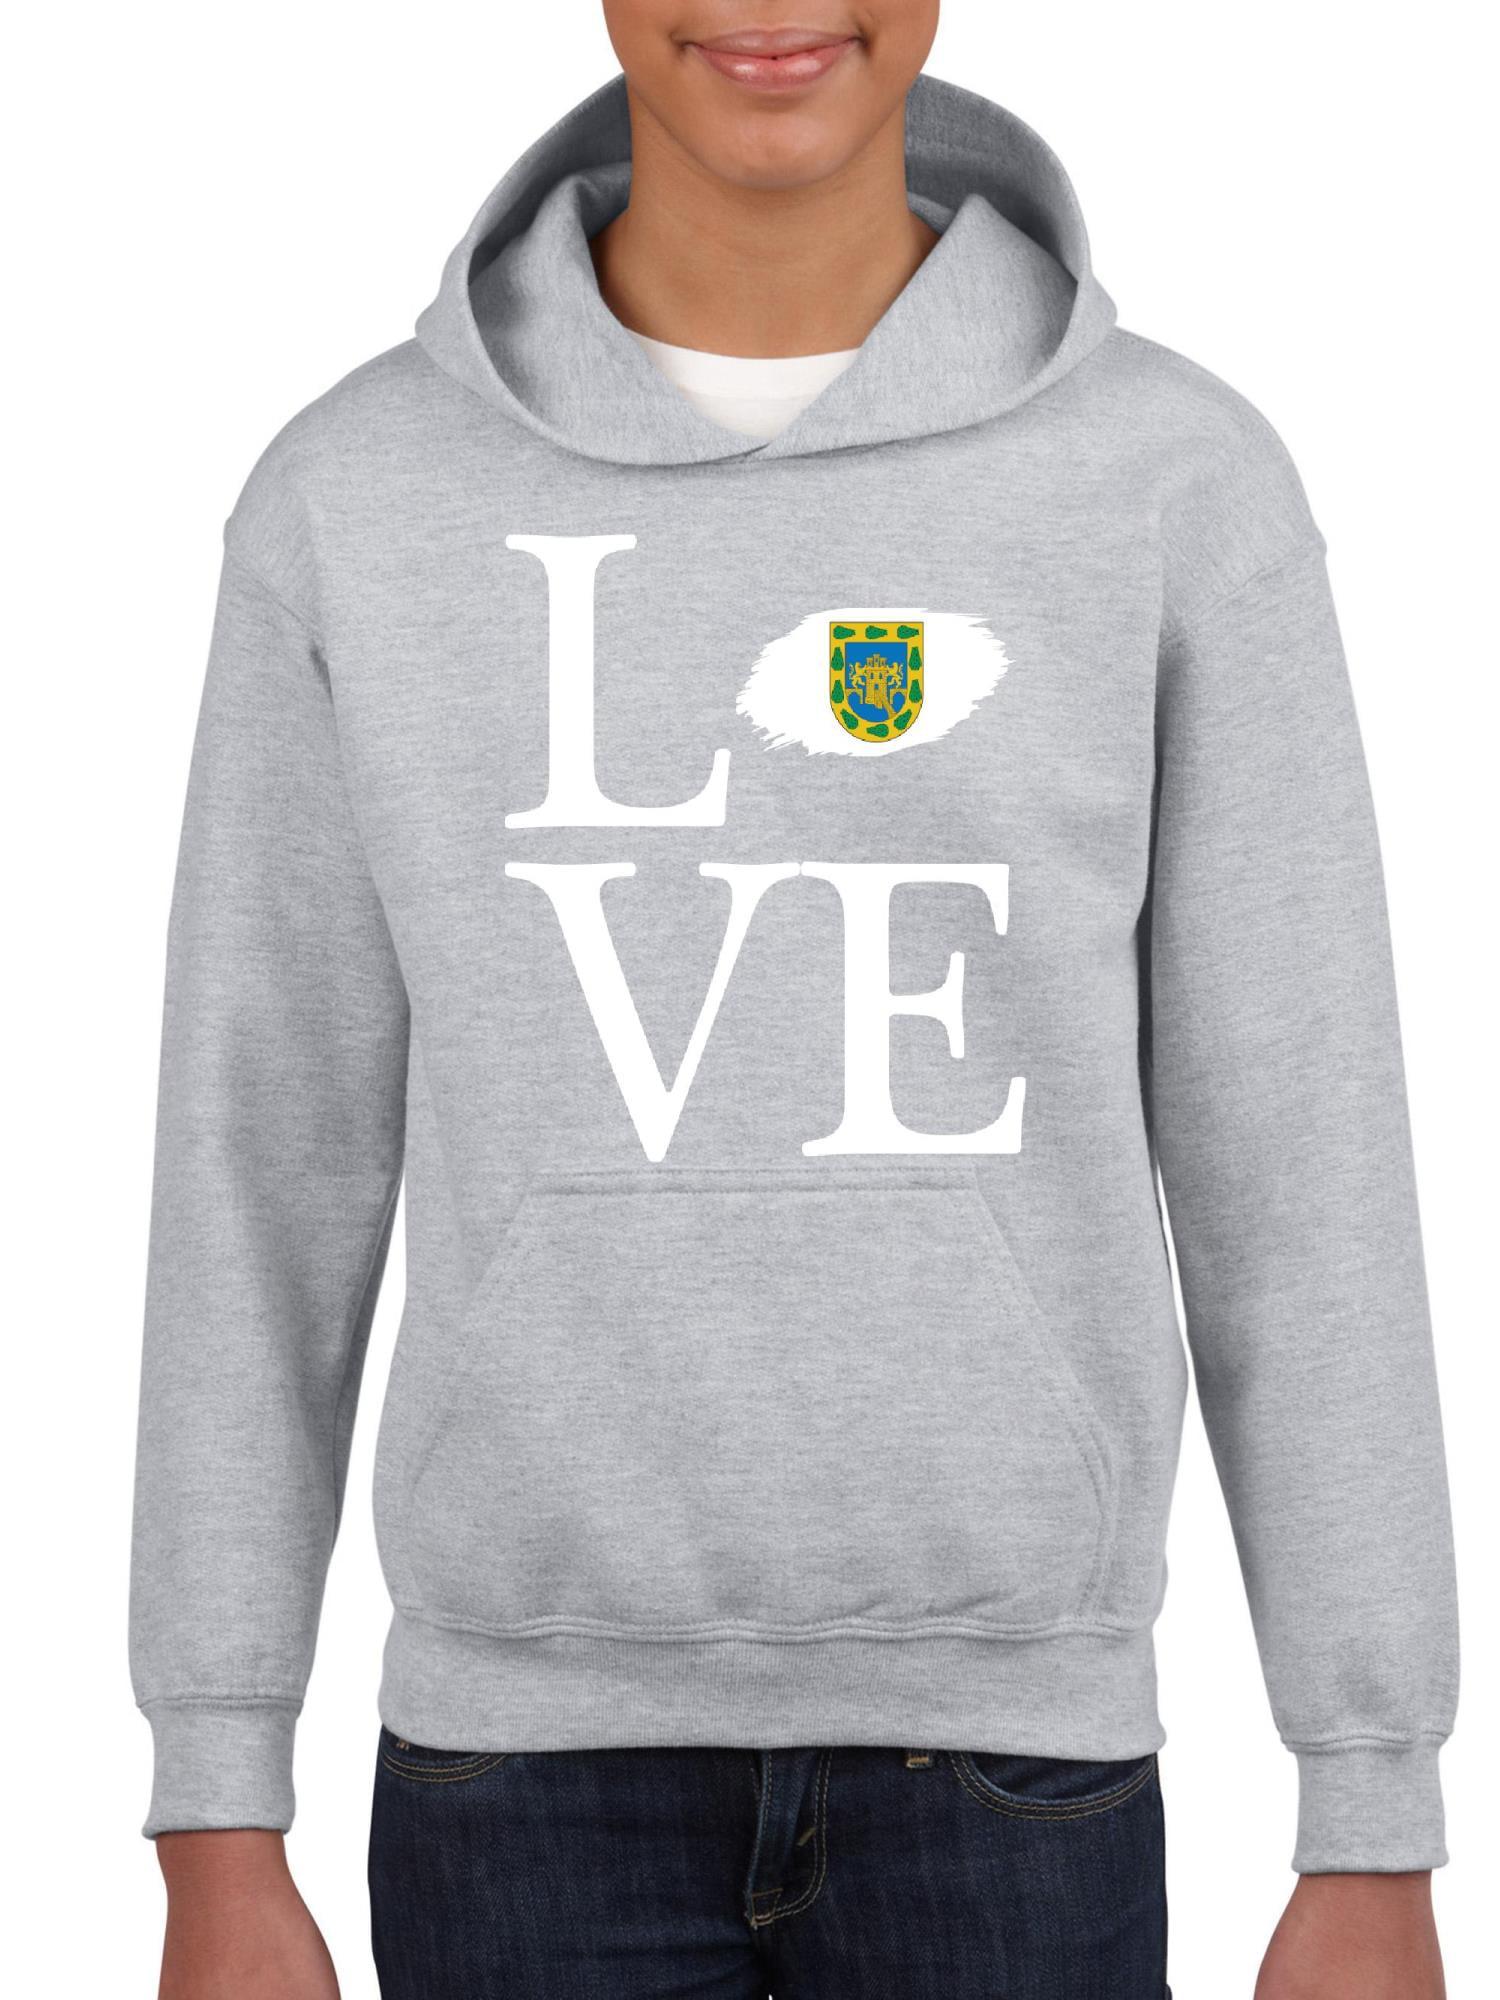 New Mexico State Design Youth Hoodie Kids Sweatshirt